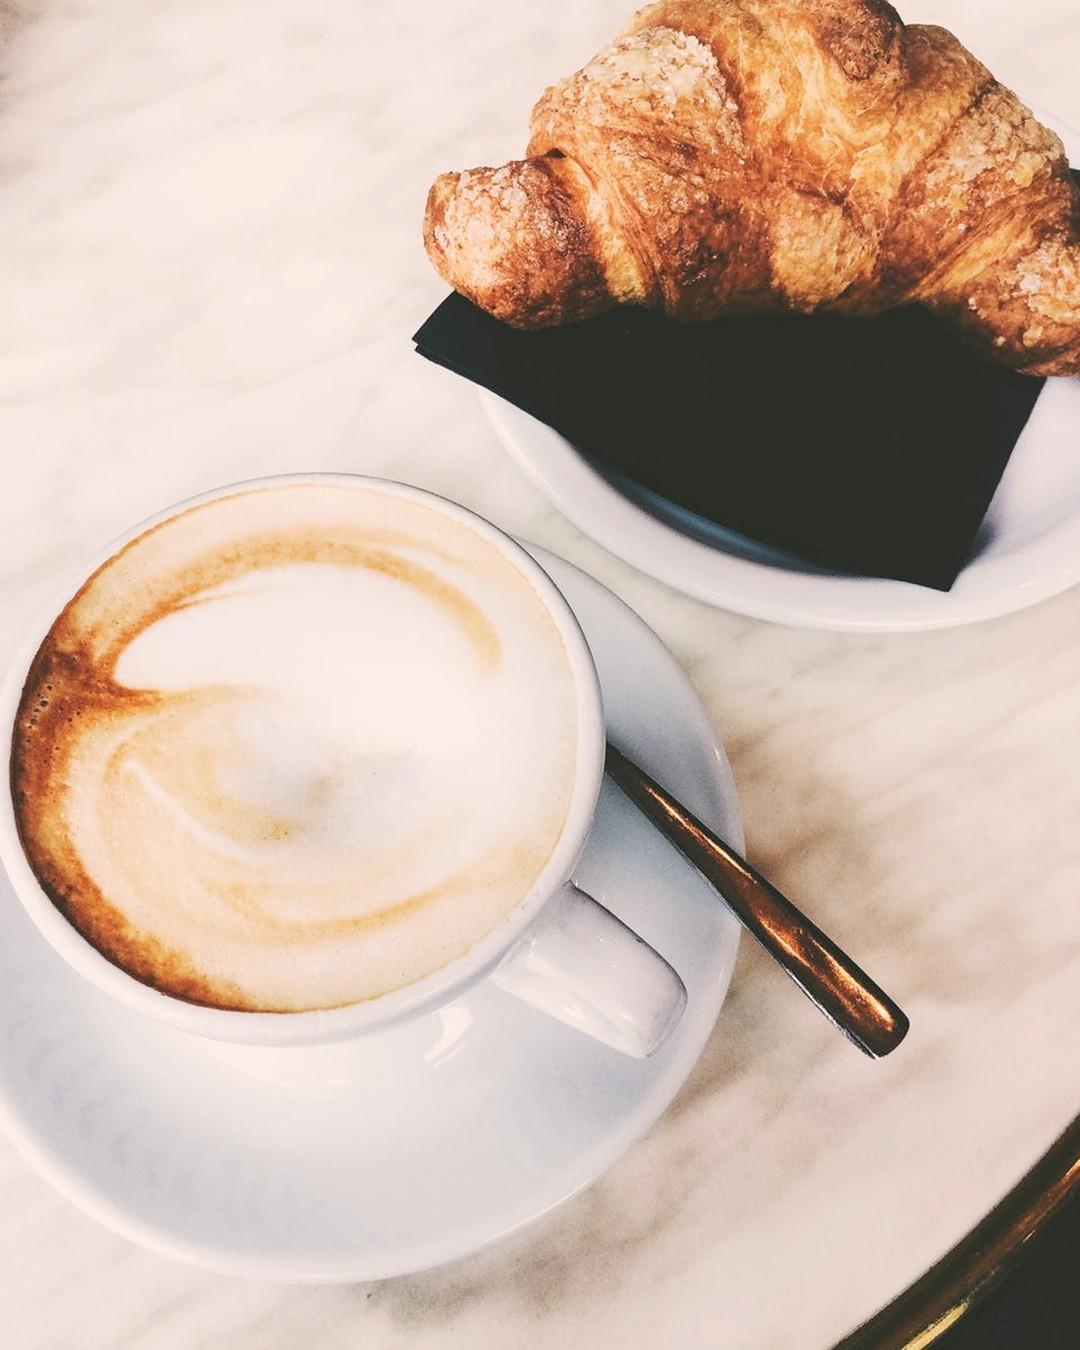 Perfect saturday morning ☕ 🥐 #coffee #croissant #coffeetime #breakfast #kawa #poland #coffeelover #cafe #café #goodmorning #morning #dziendobry #photooftheday #food #instagood #weekend #summerweekend #kawa #cappuccino #kawaicroissant #perfectmorning #morningviber #sunnyday #sobota #sobotawdomu